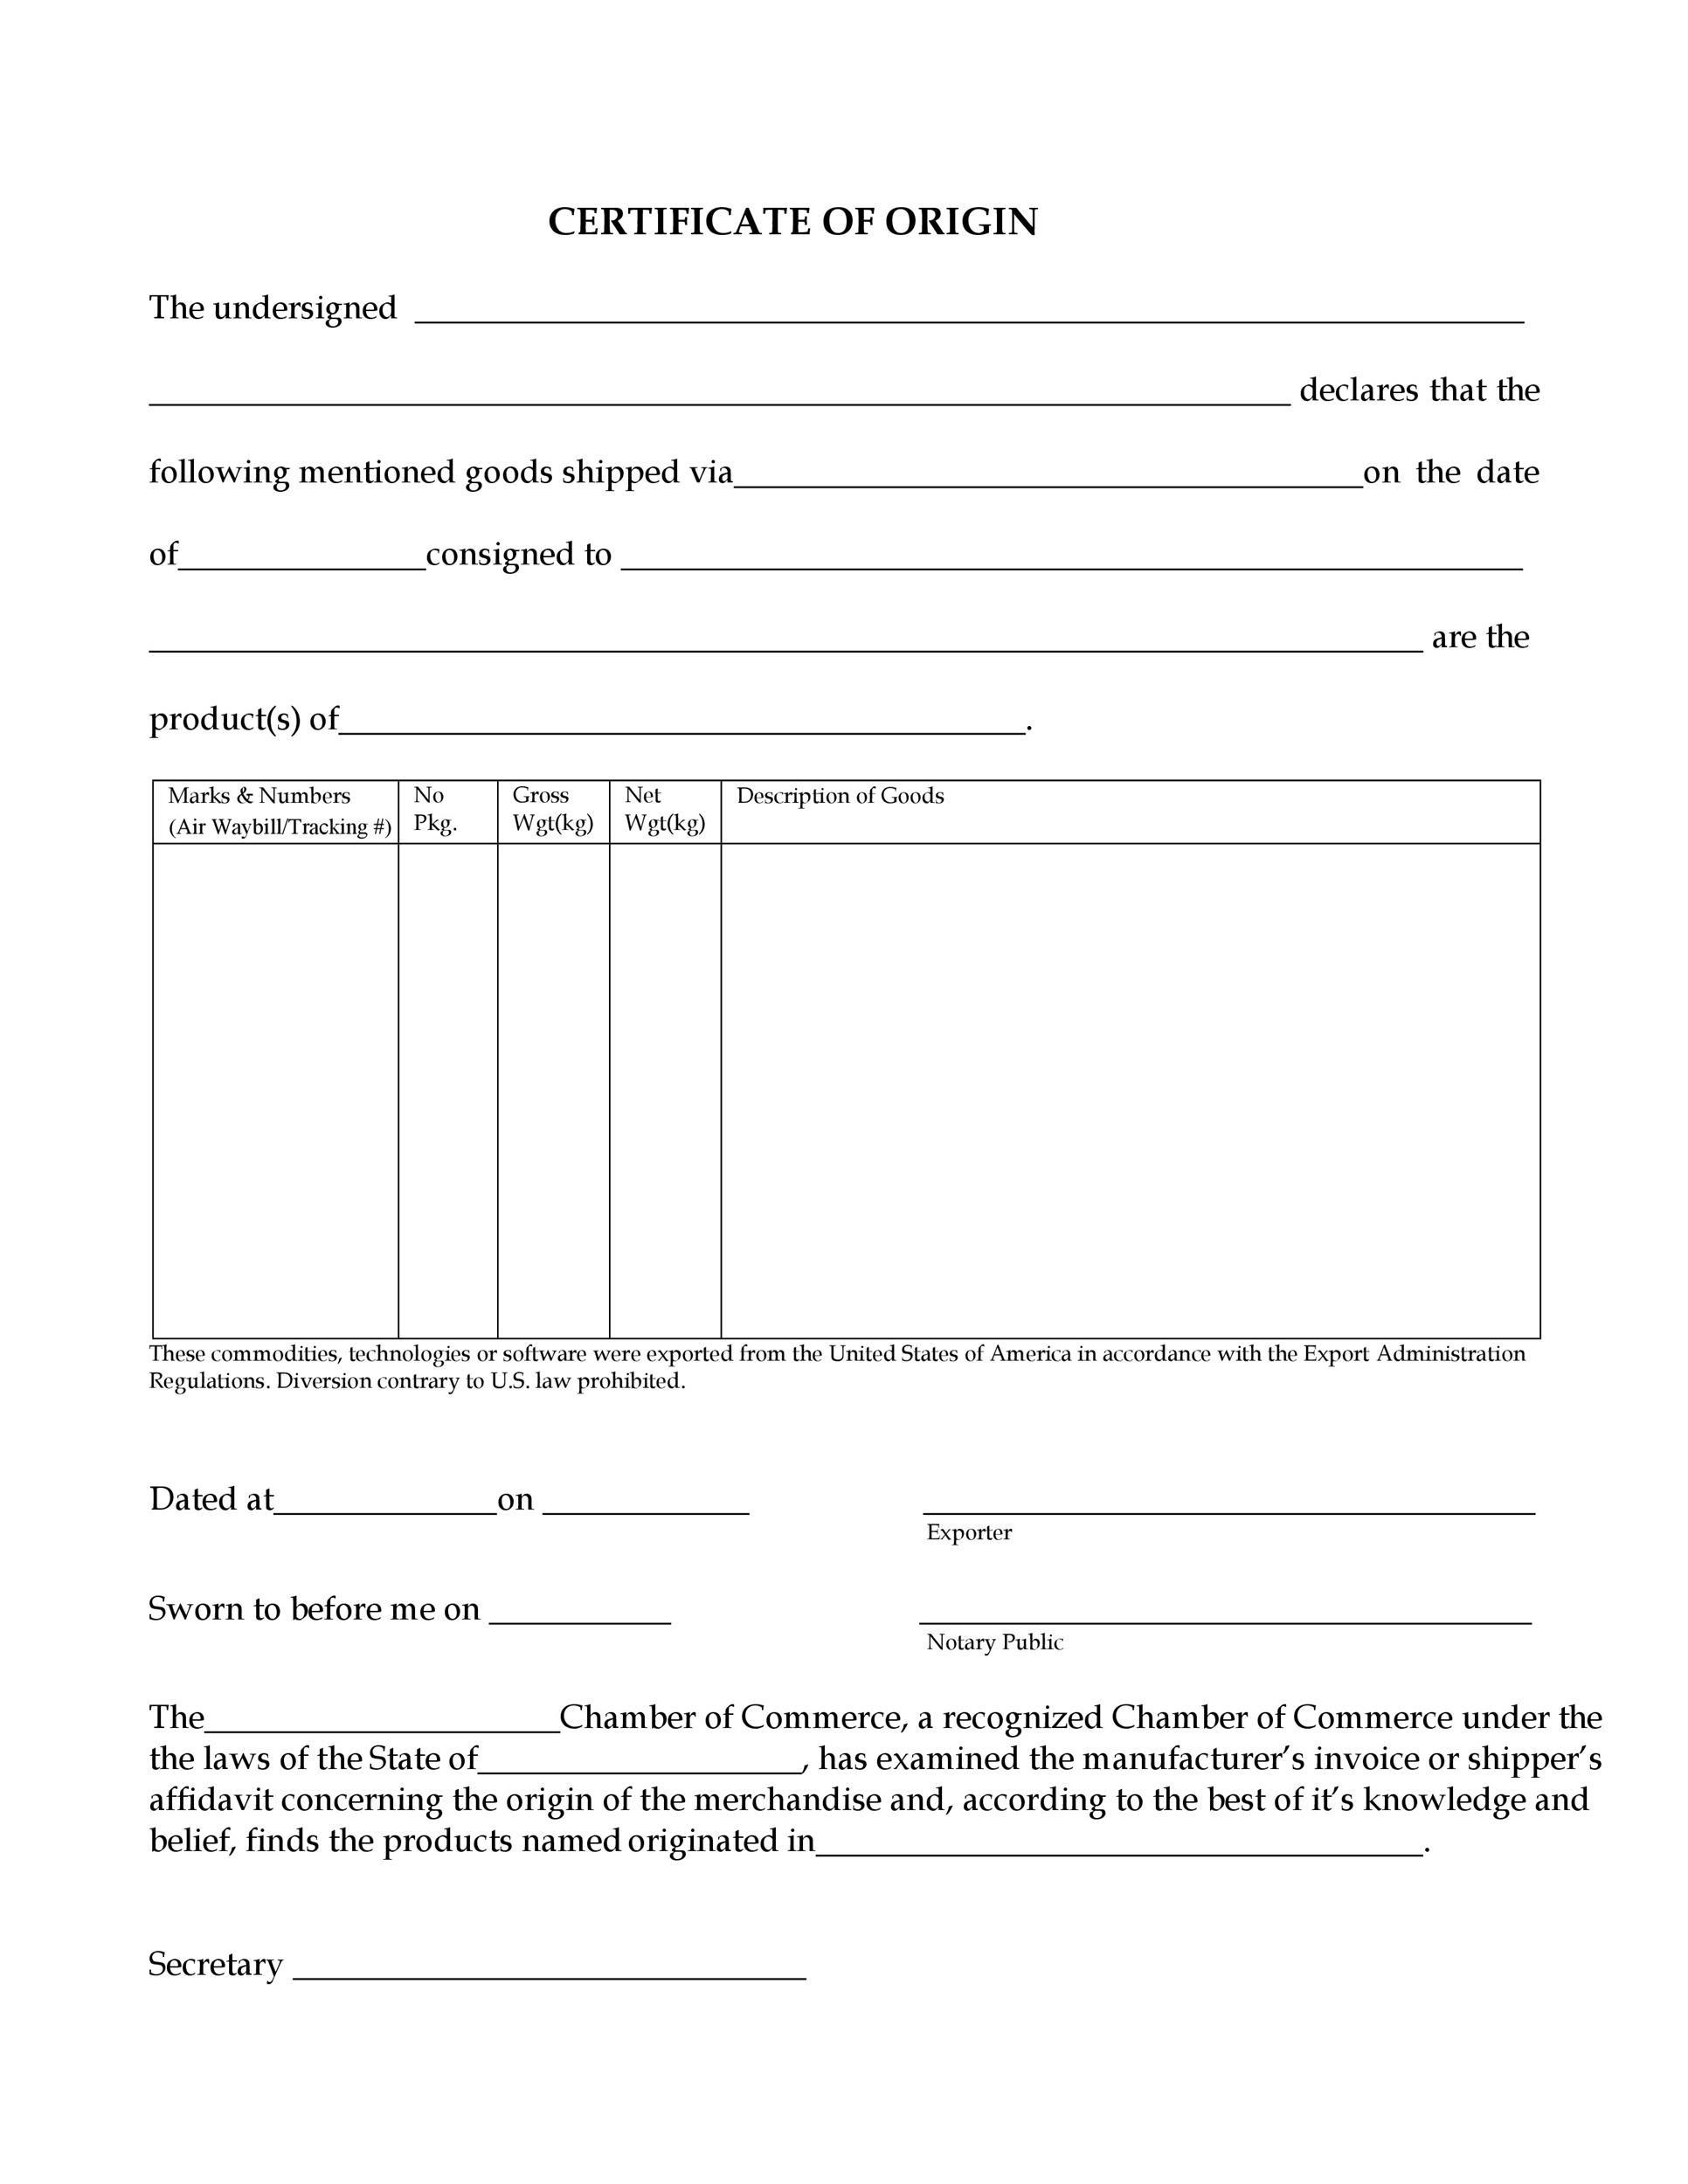 Free certificate of origin 06